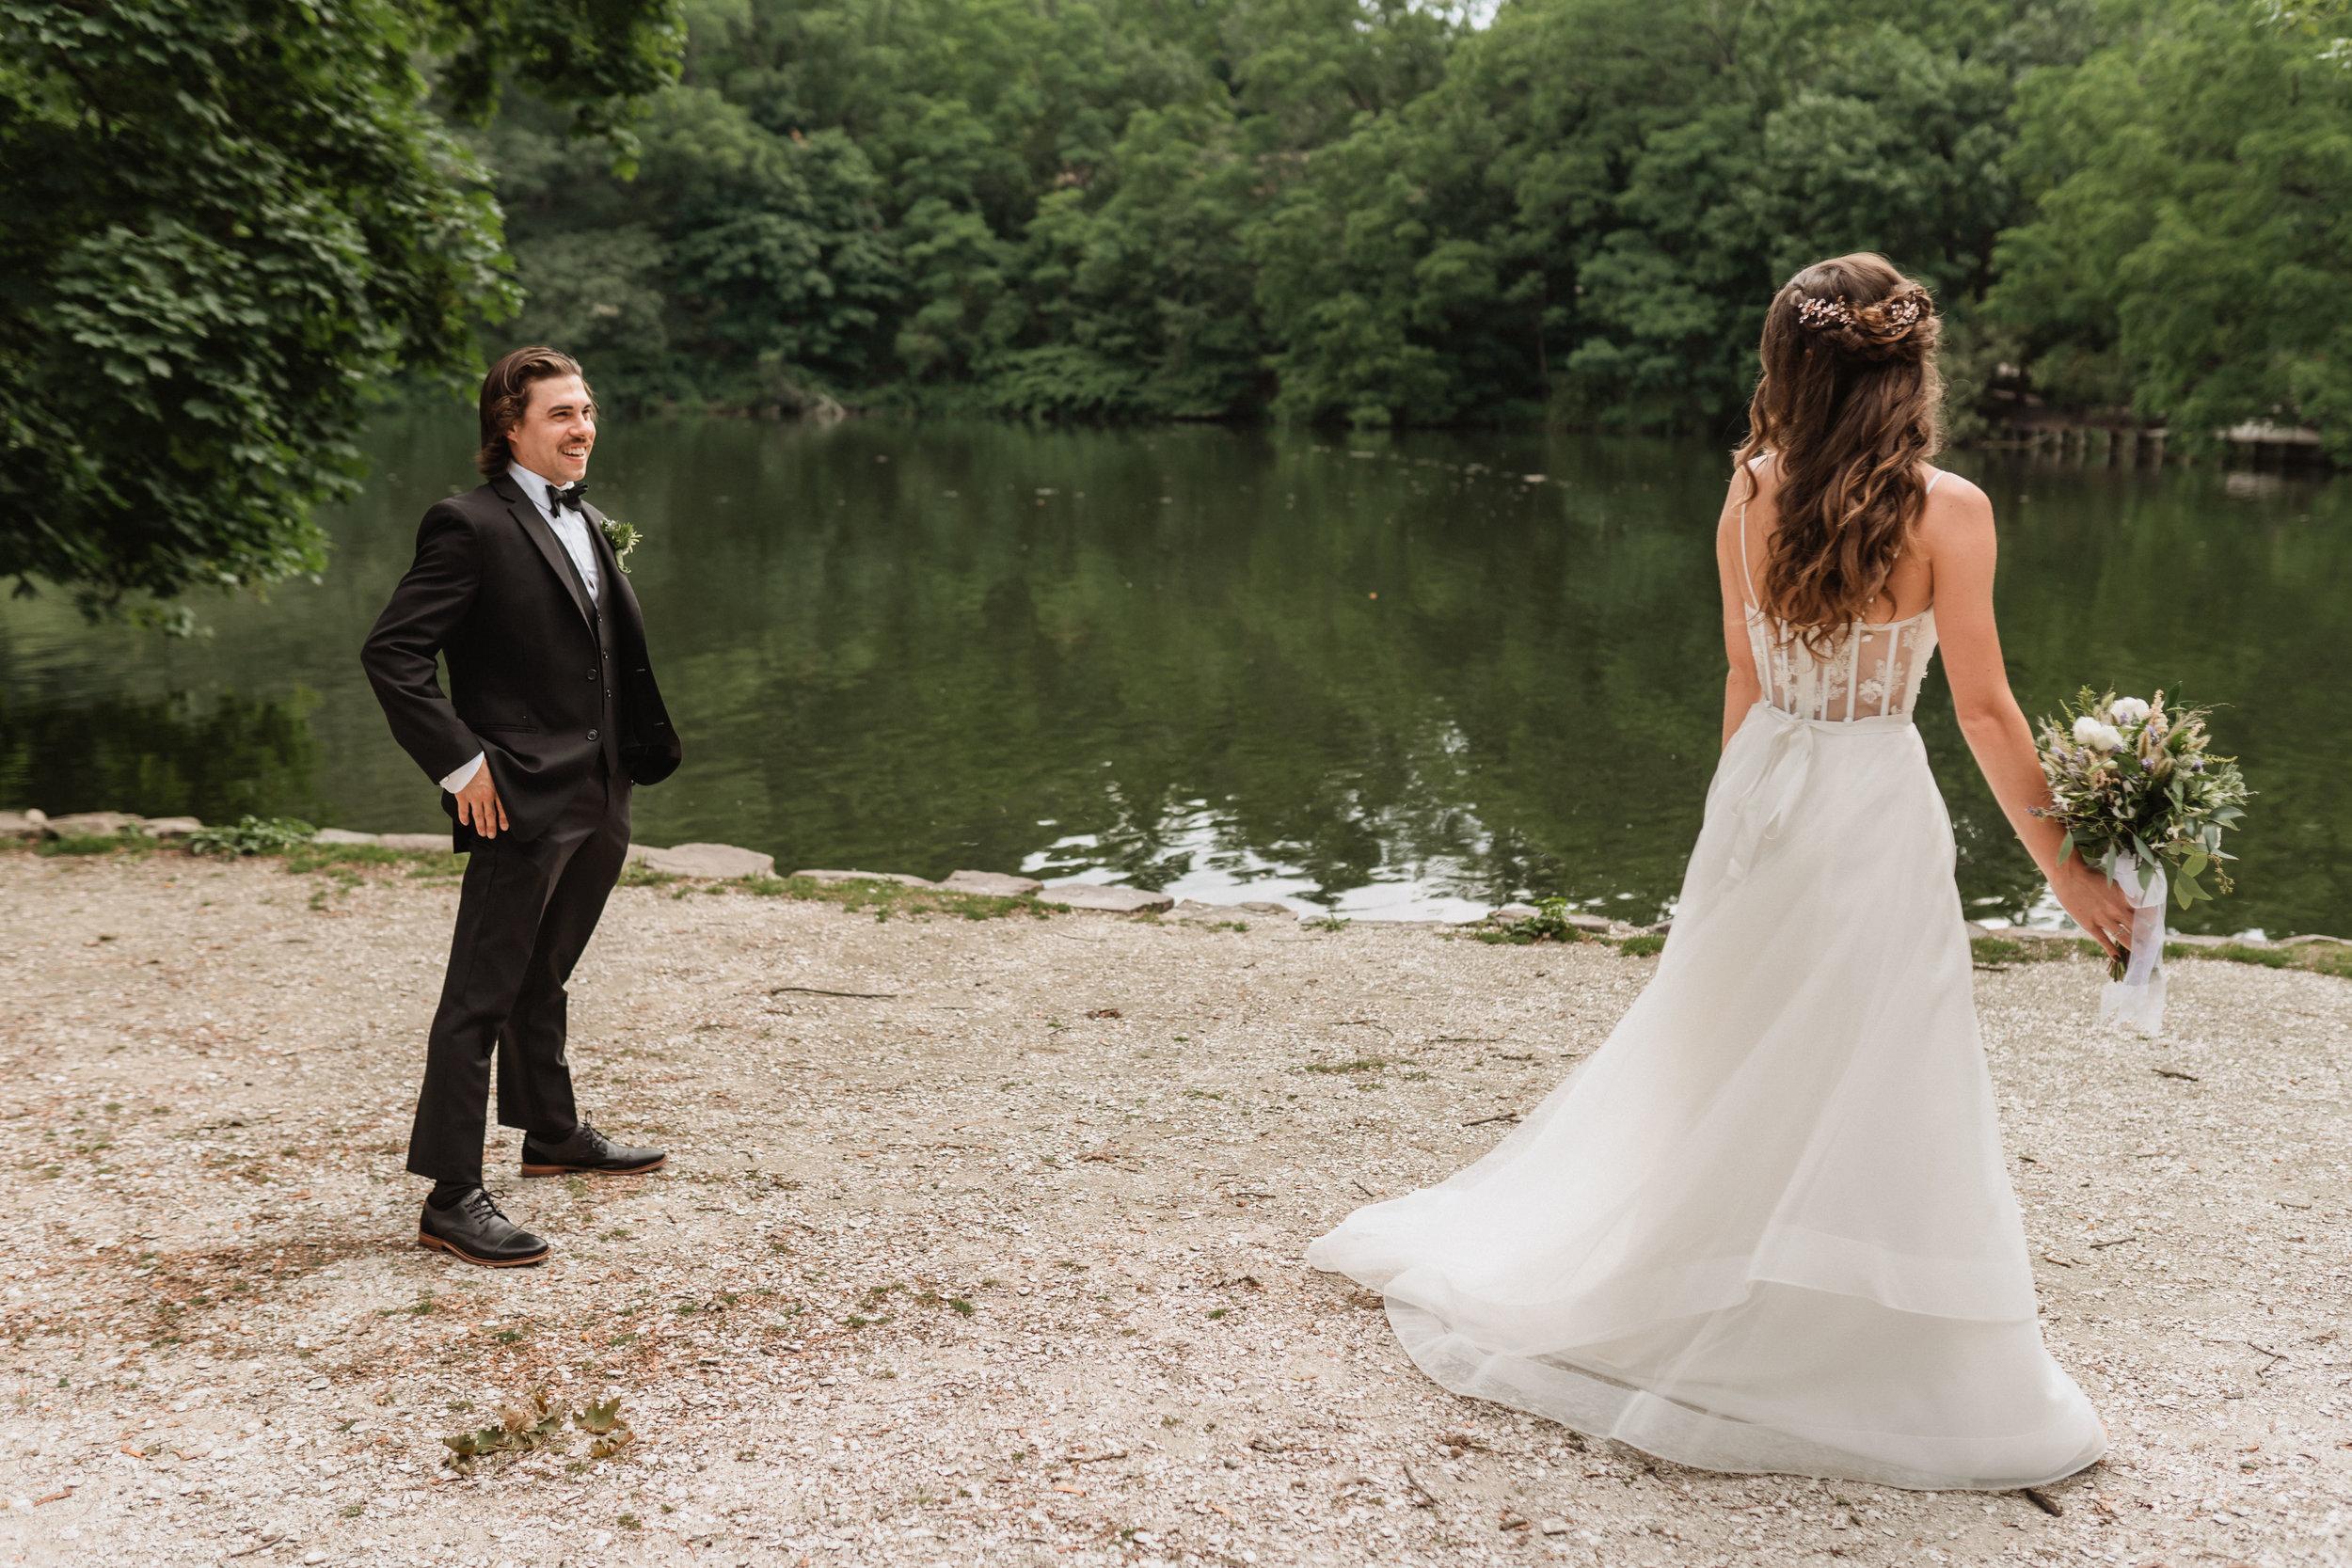 JJP_Emily&Joey_Summer_Old Field Club Wedding_19.jpg